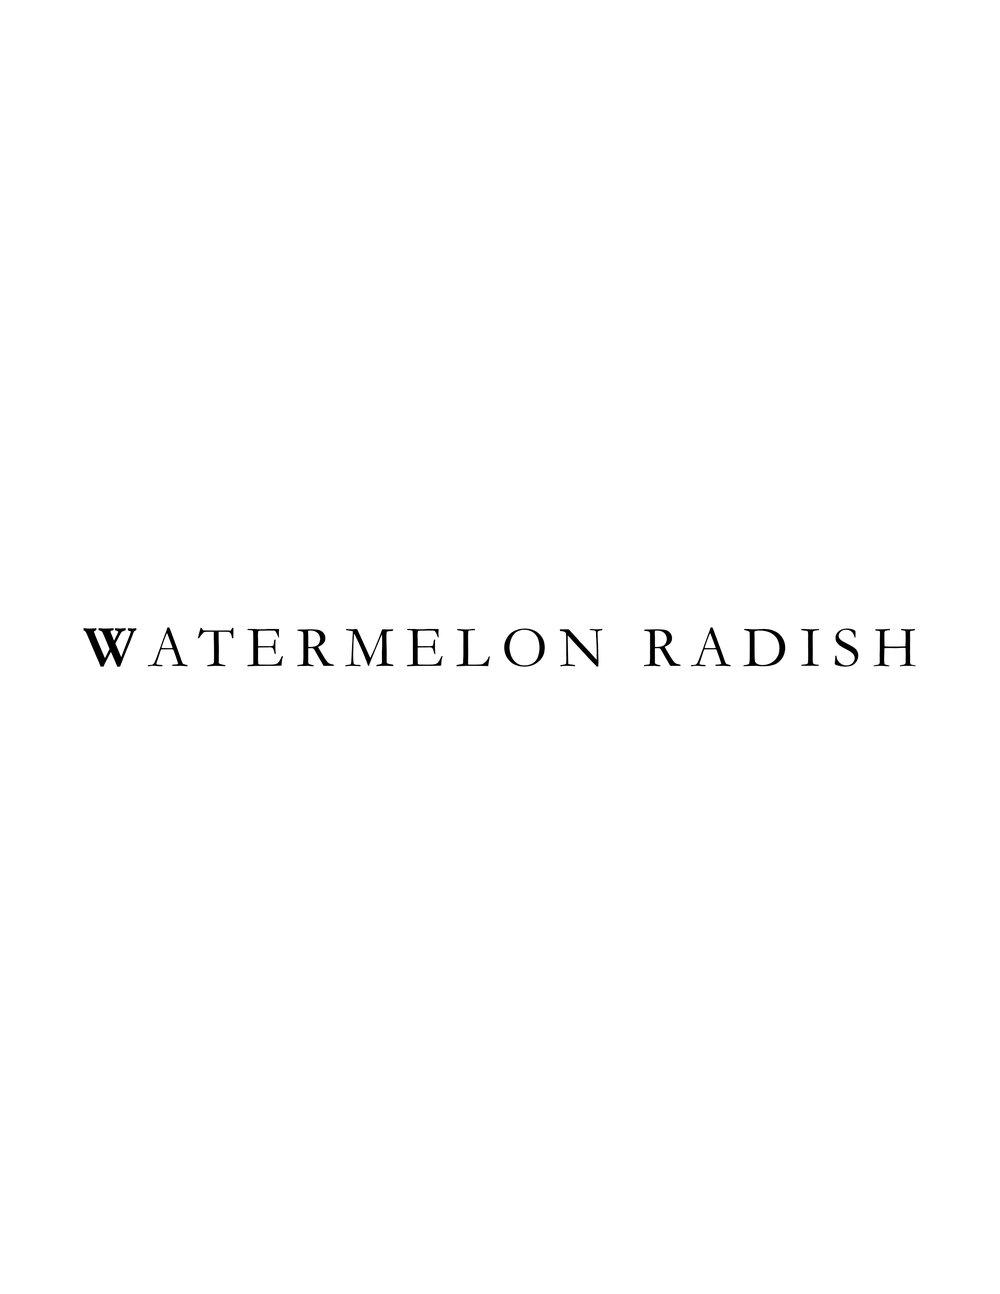 Watermelon Radish TEXT.jpg